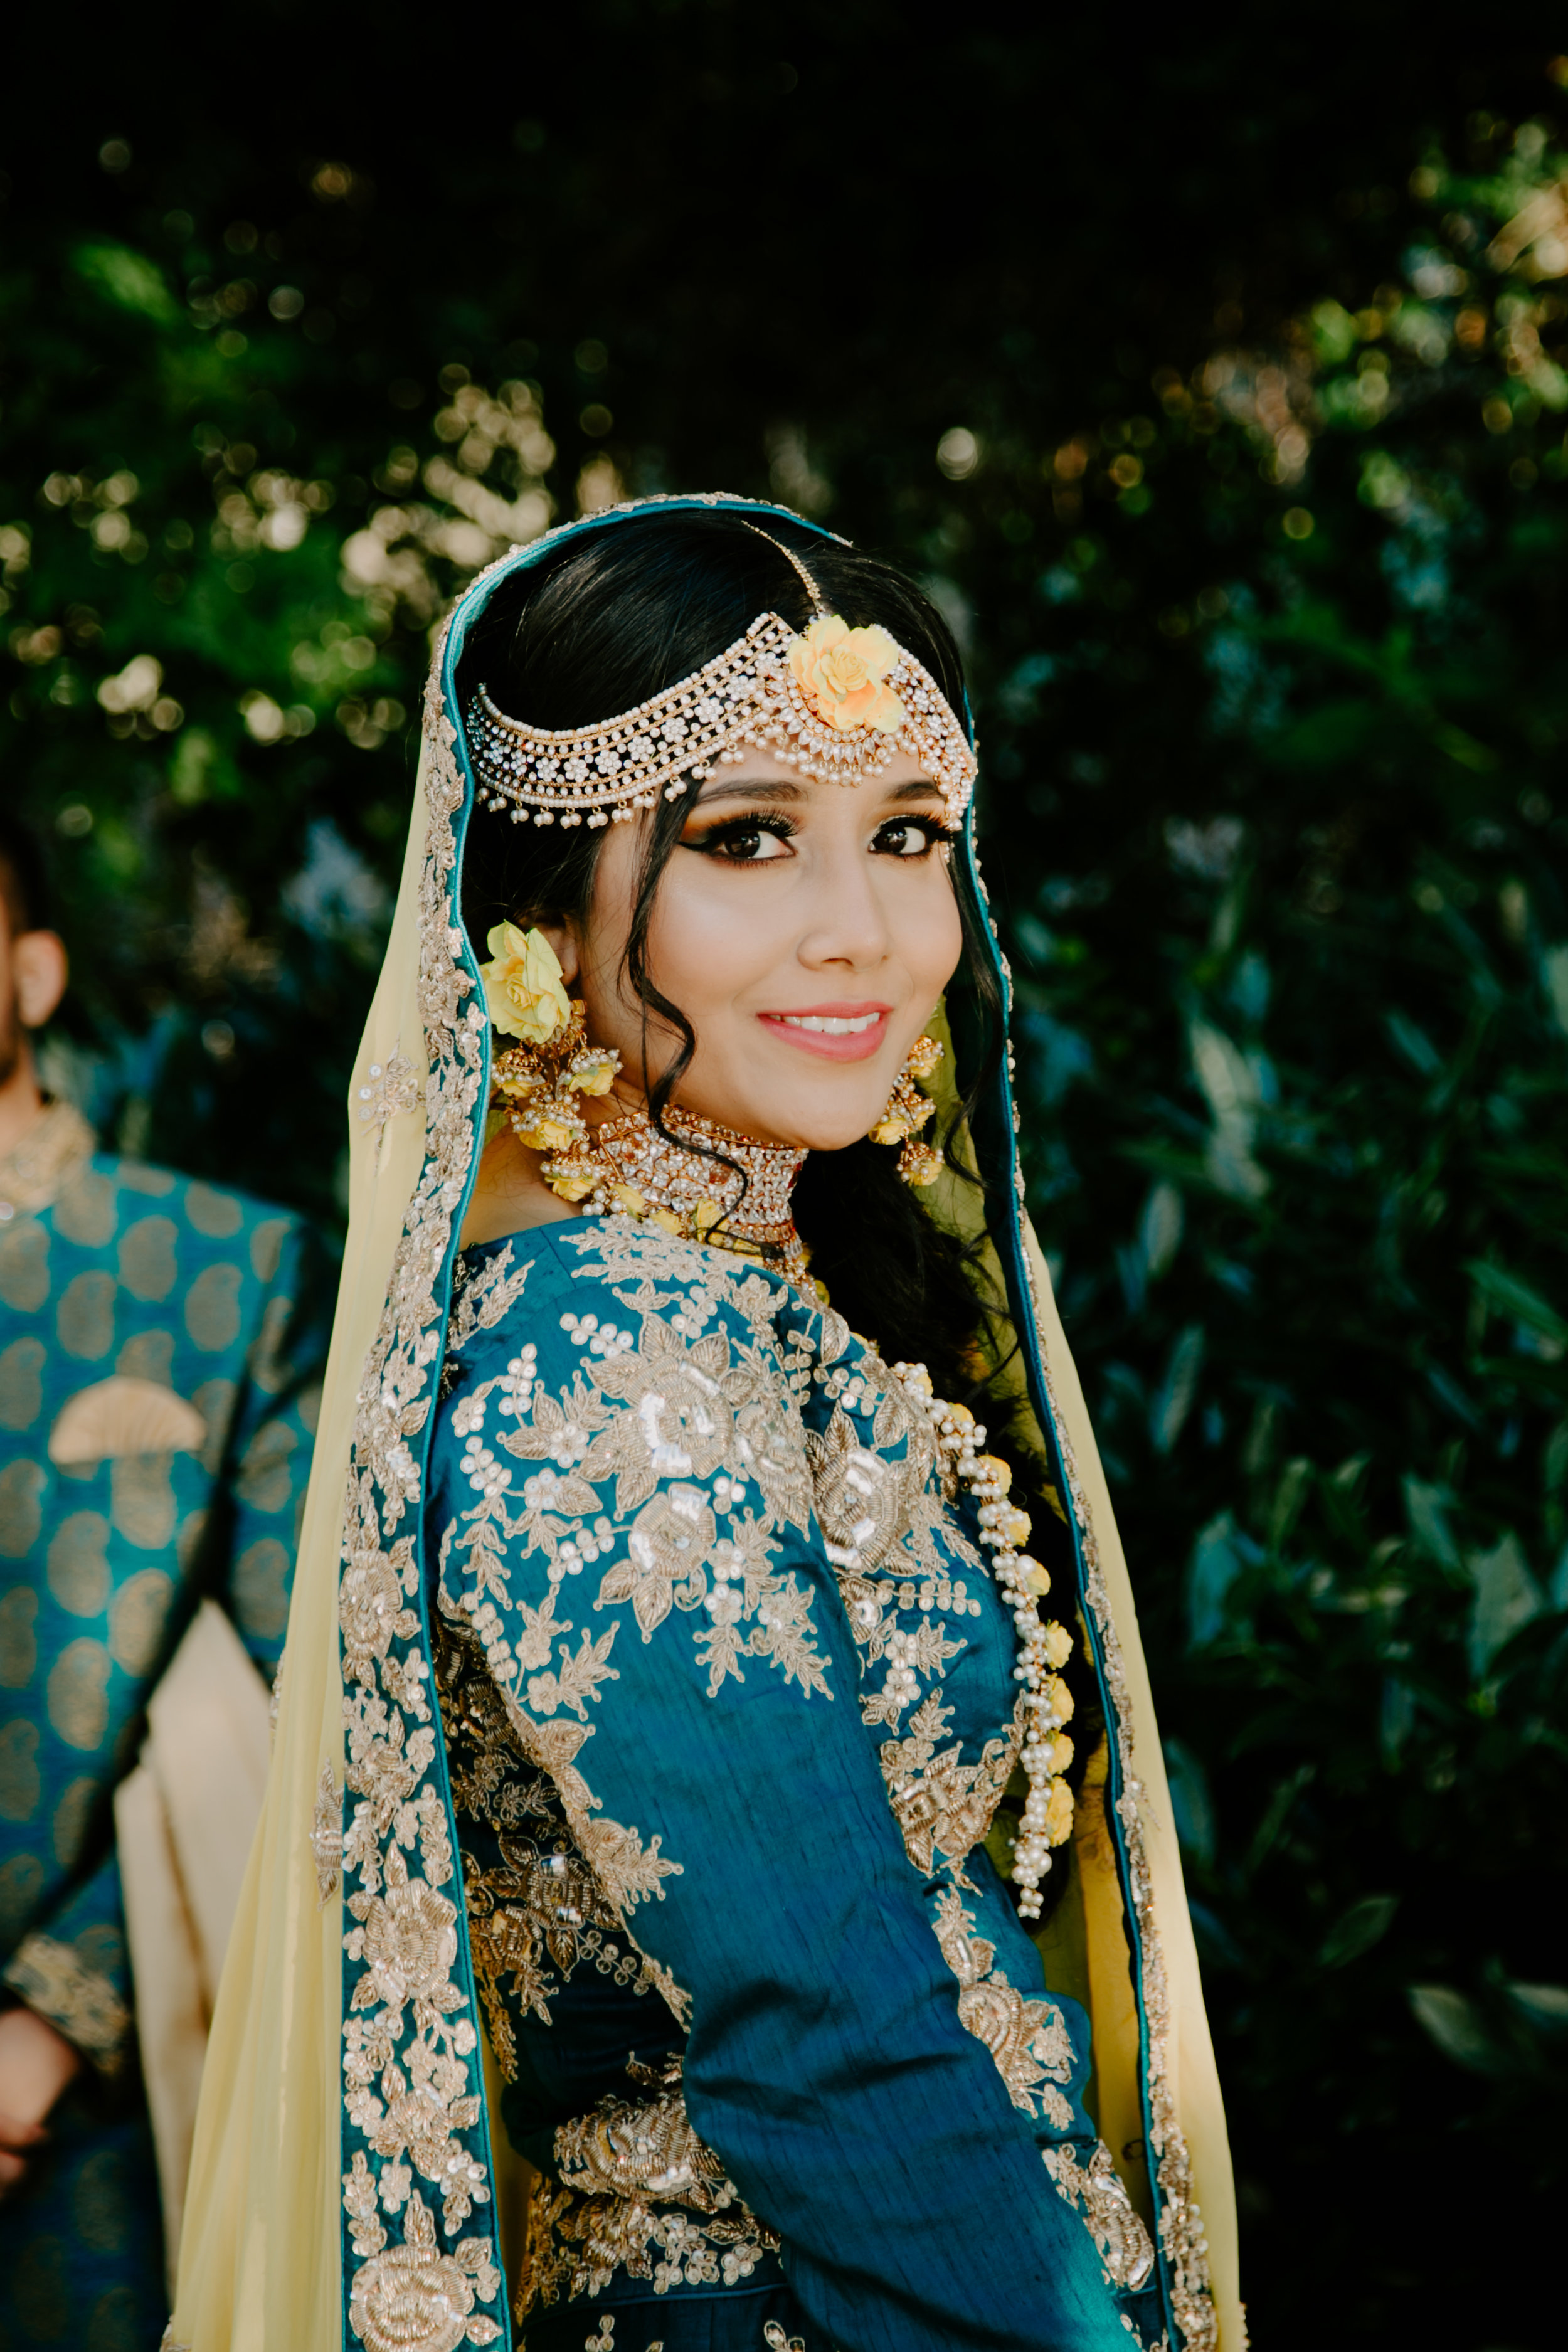 GantryPlazaStatePark_NYC_TahsinaSaif_Wedding-13.jpg